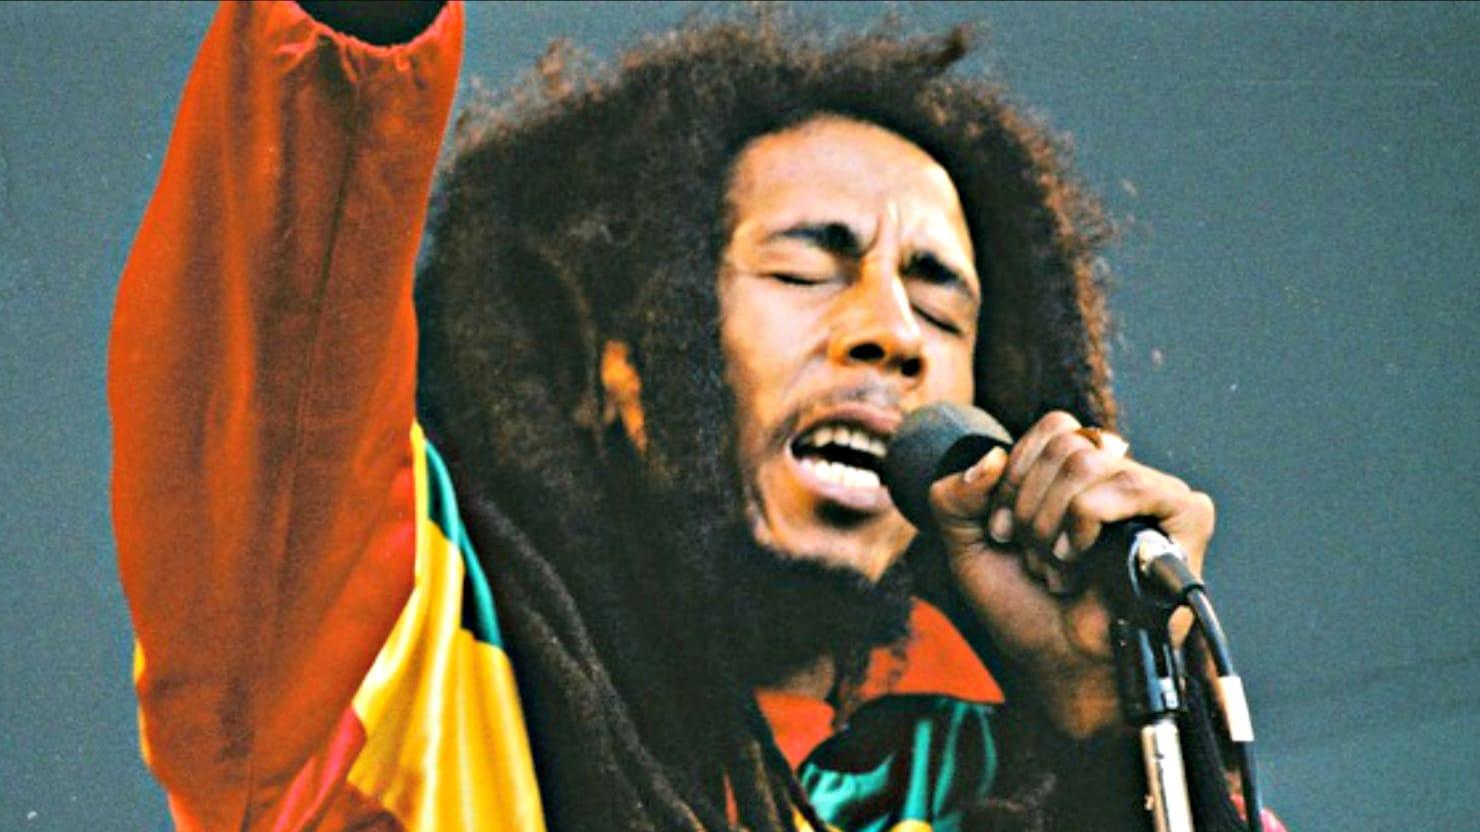 a biography of bob marley the jamaican reggae singer Bob marley was a jamaican reggae singer and songwriter net worth: bob marley's net worth is $130 million (celebrity net worth, 2014) childhood: bob marley was born in the jamaican village of nine mile, saint ann parish.